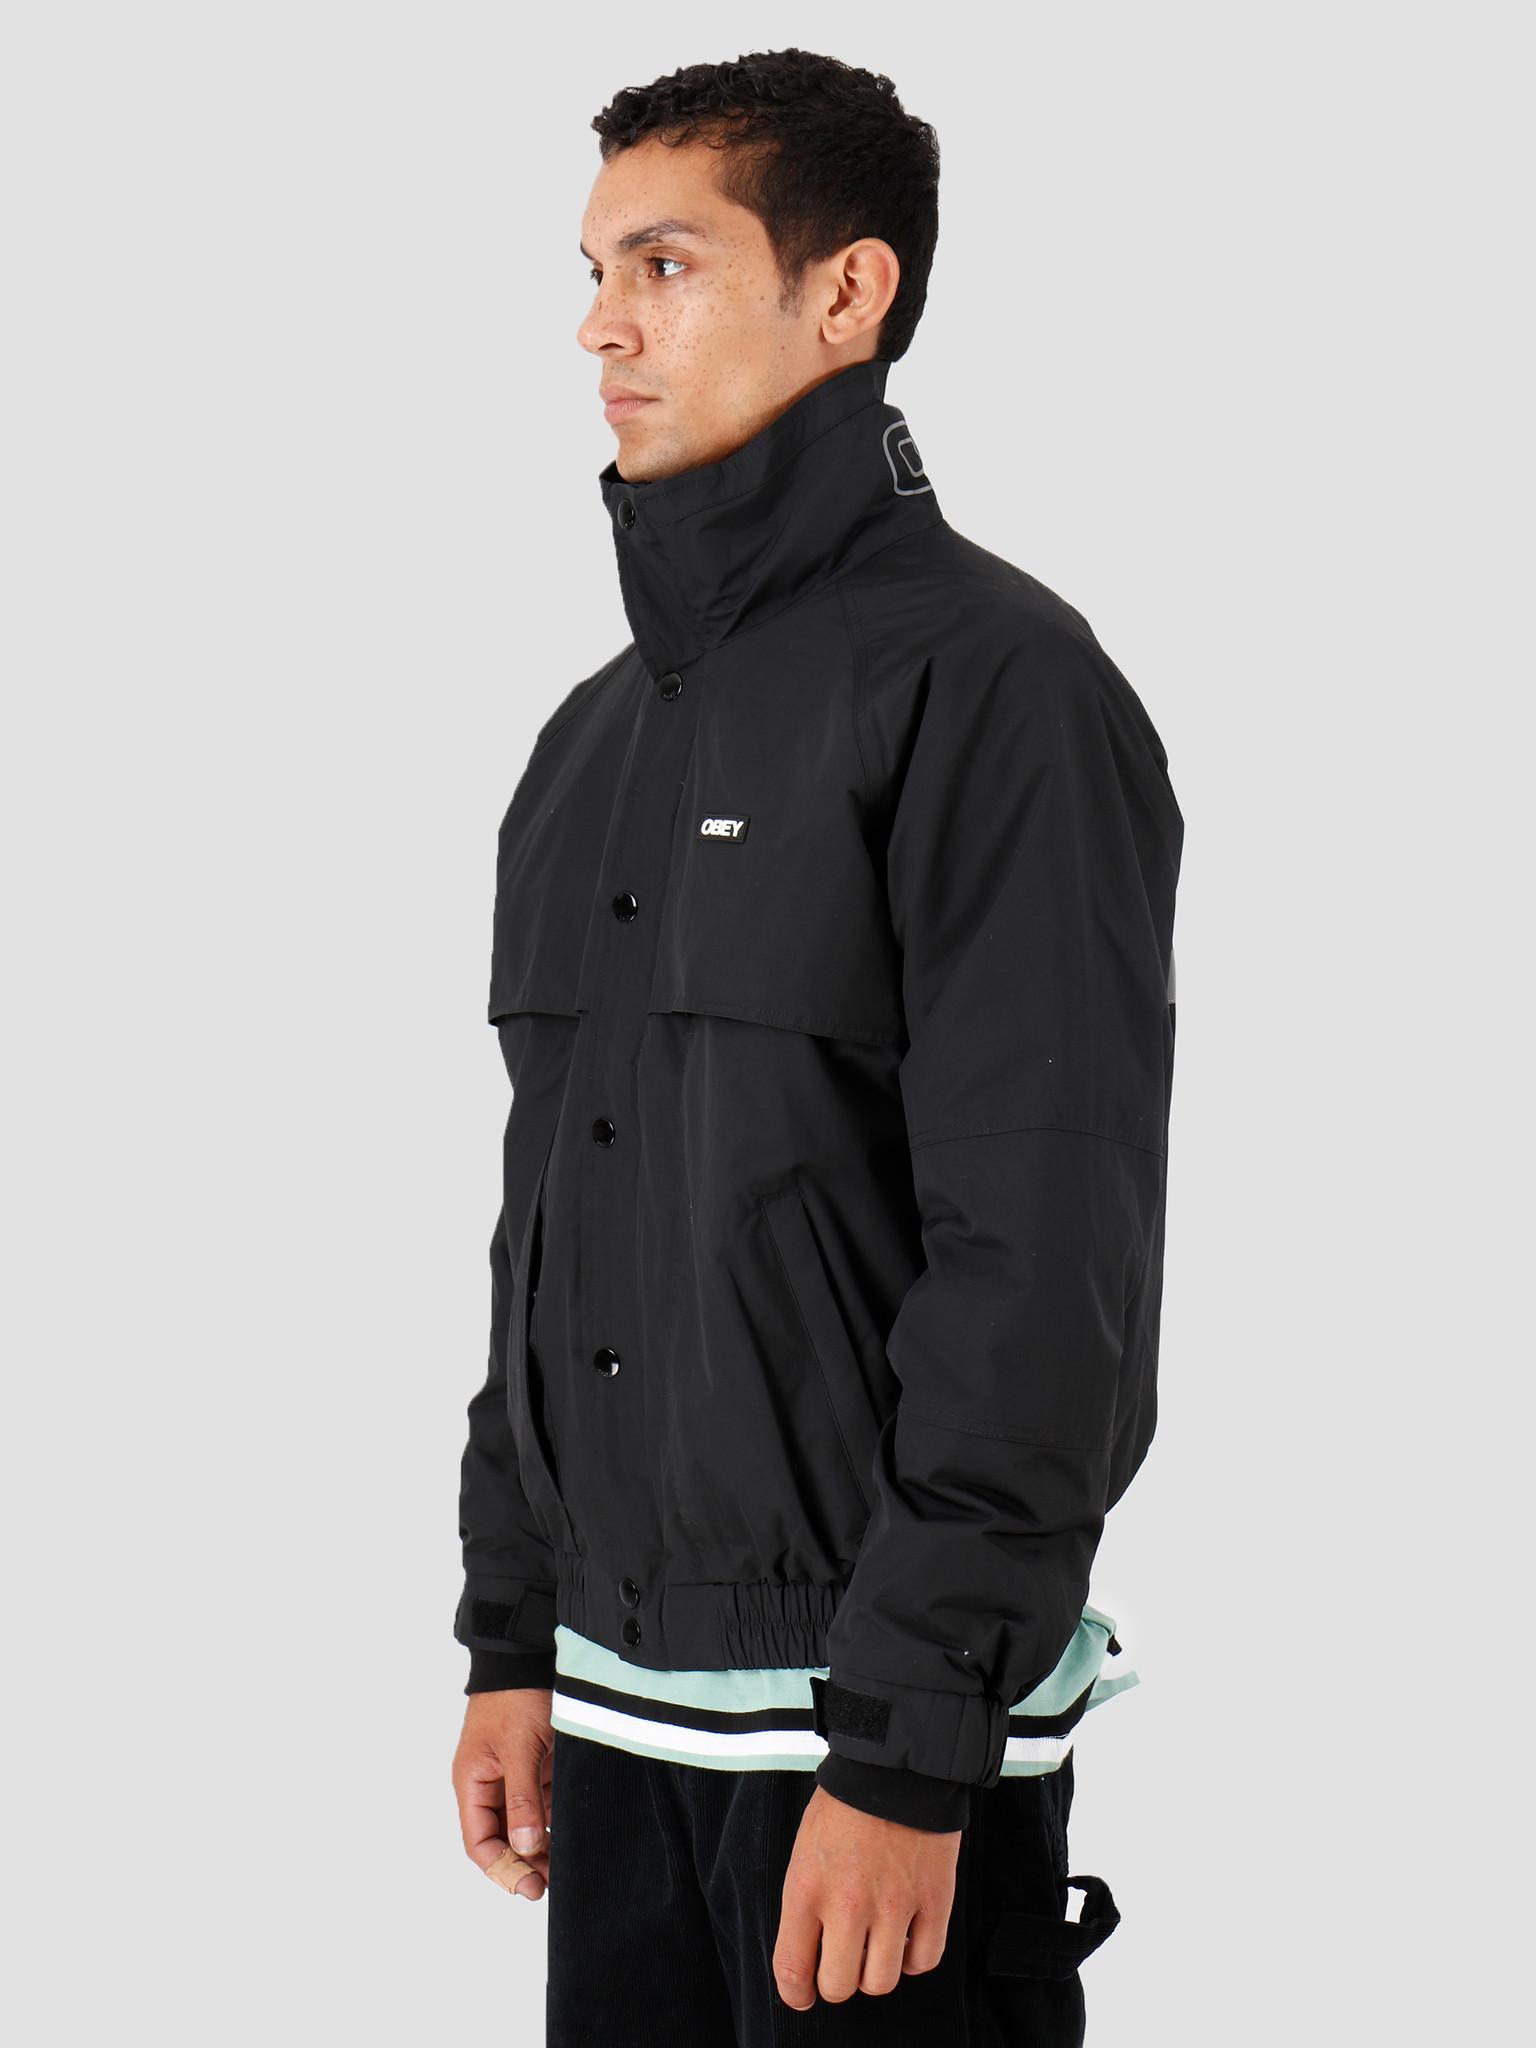 Obey Obey Layers Jacket Black 121800381-BLK